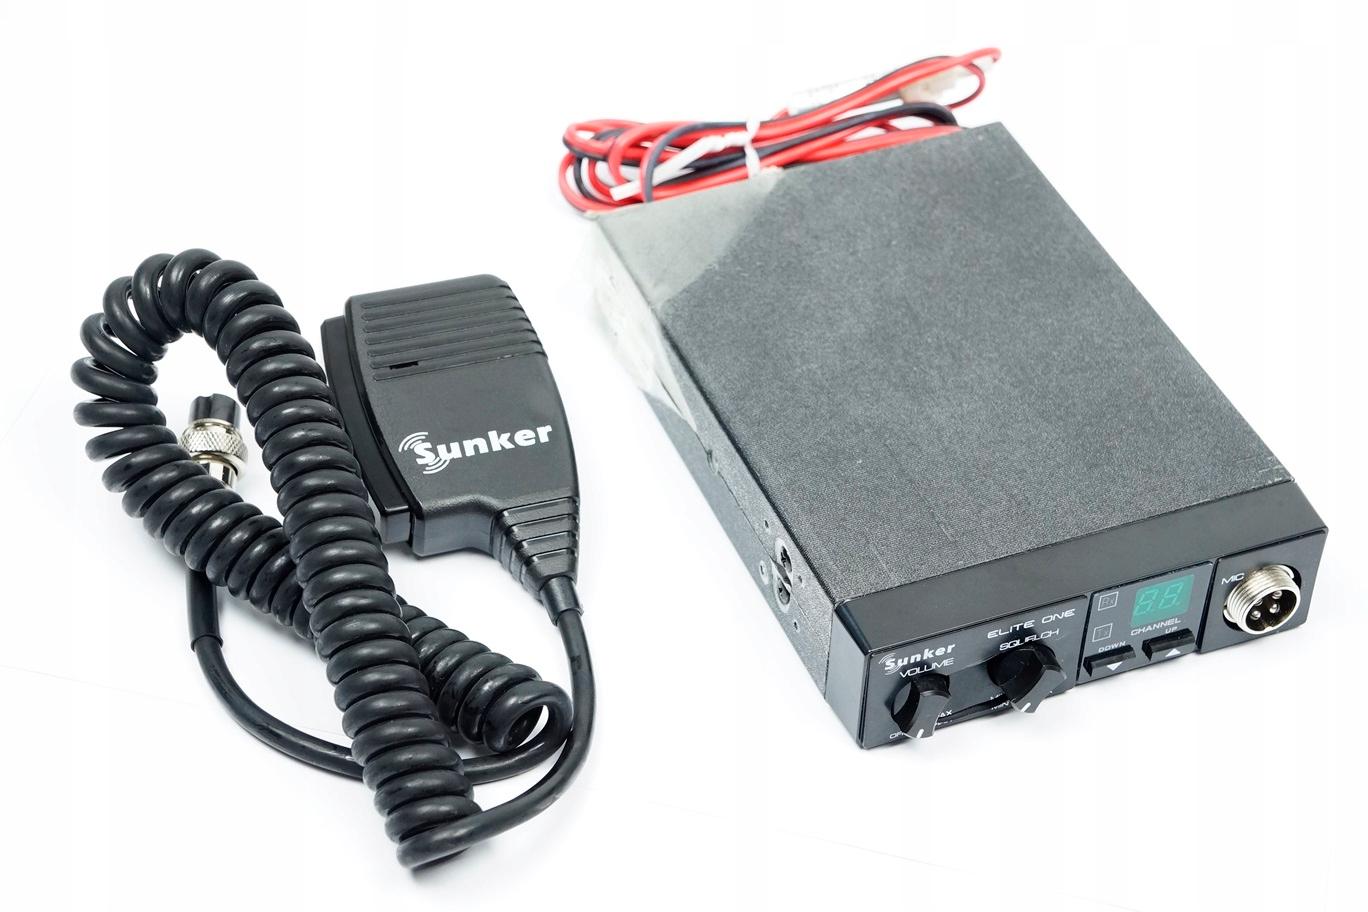 SUNKER ELITE ONE (URZ0235) Radio CB